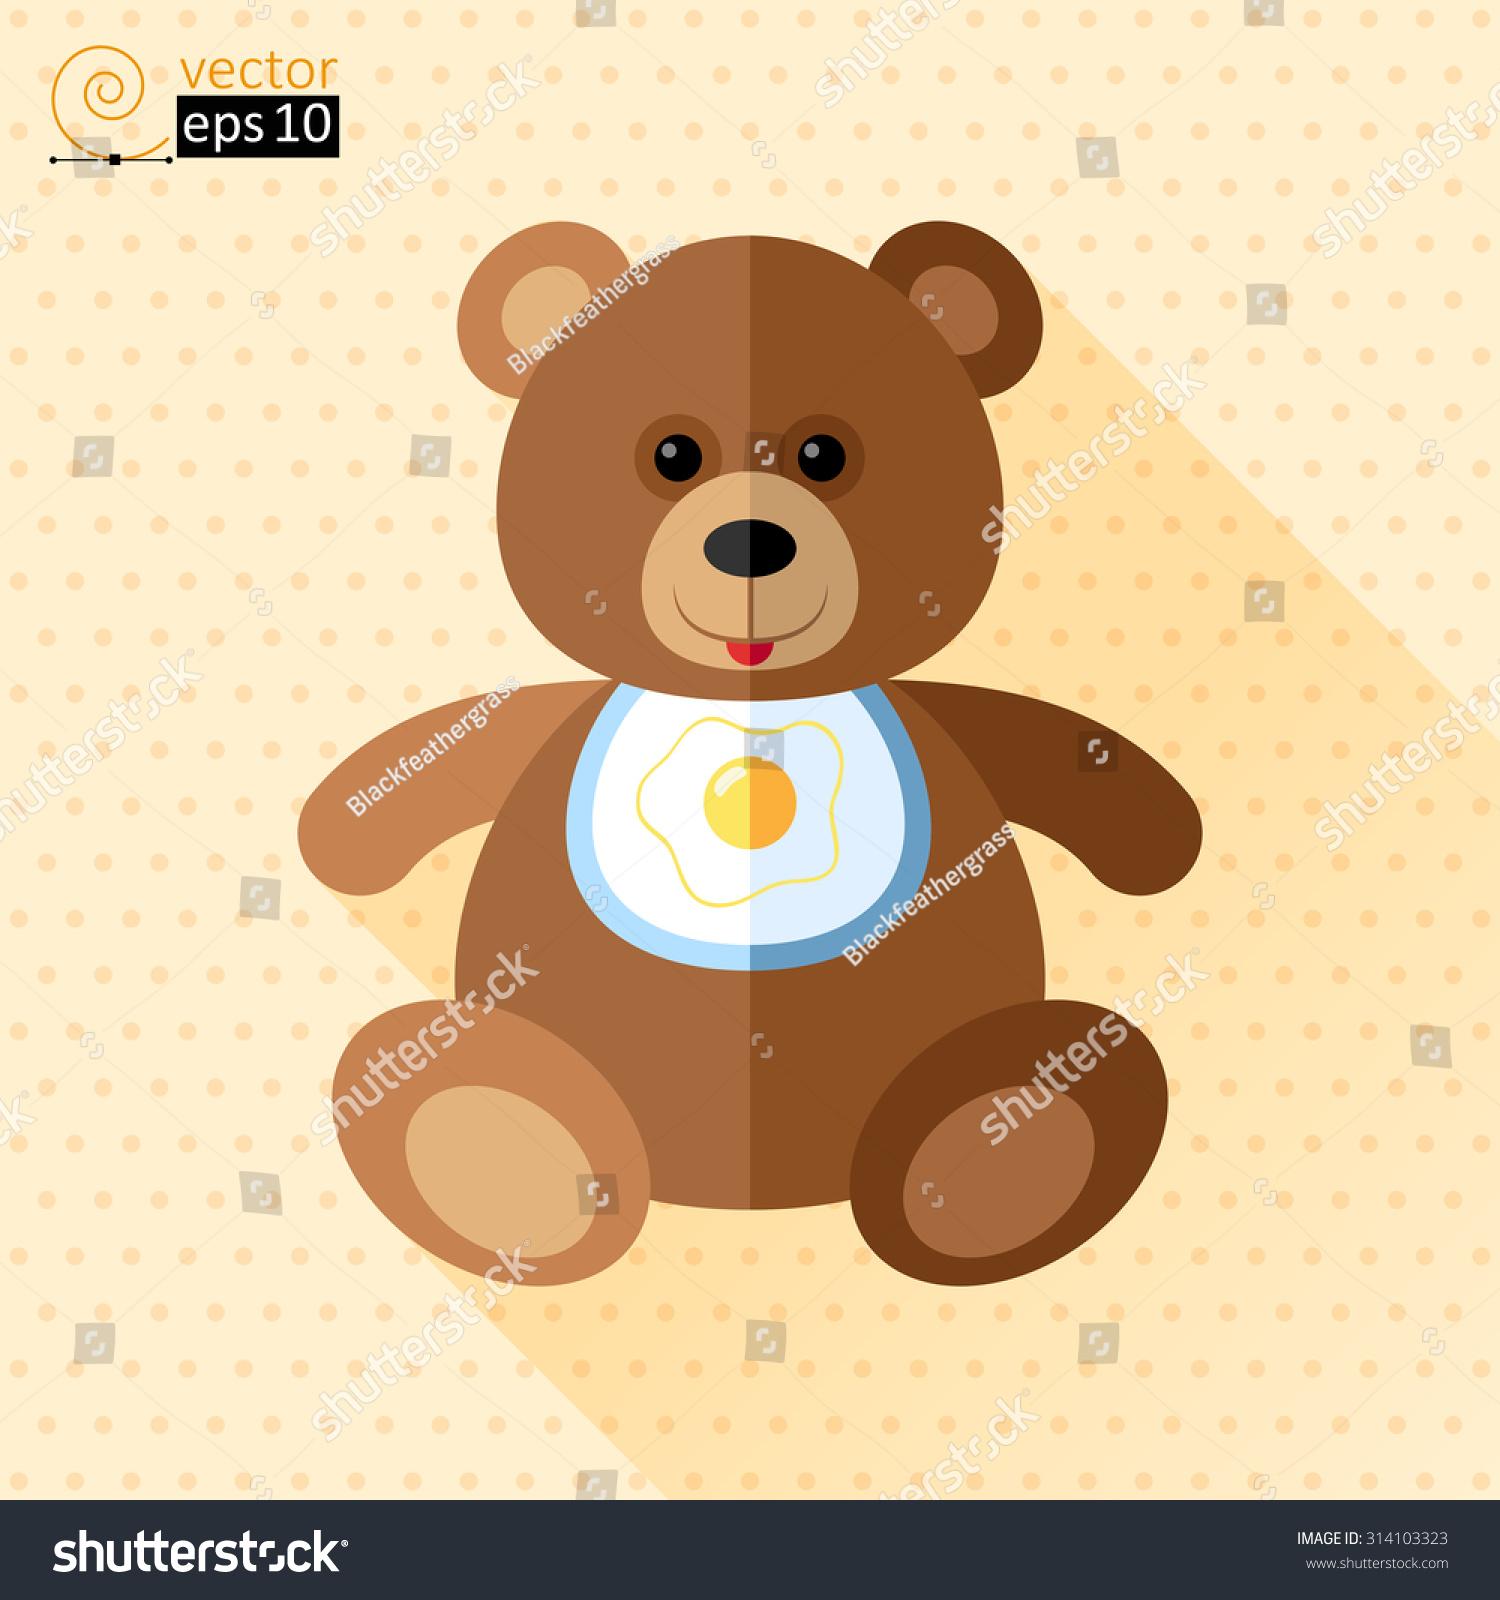 vector teddy bear flat icon stock vector 314103323 shutterstock